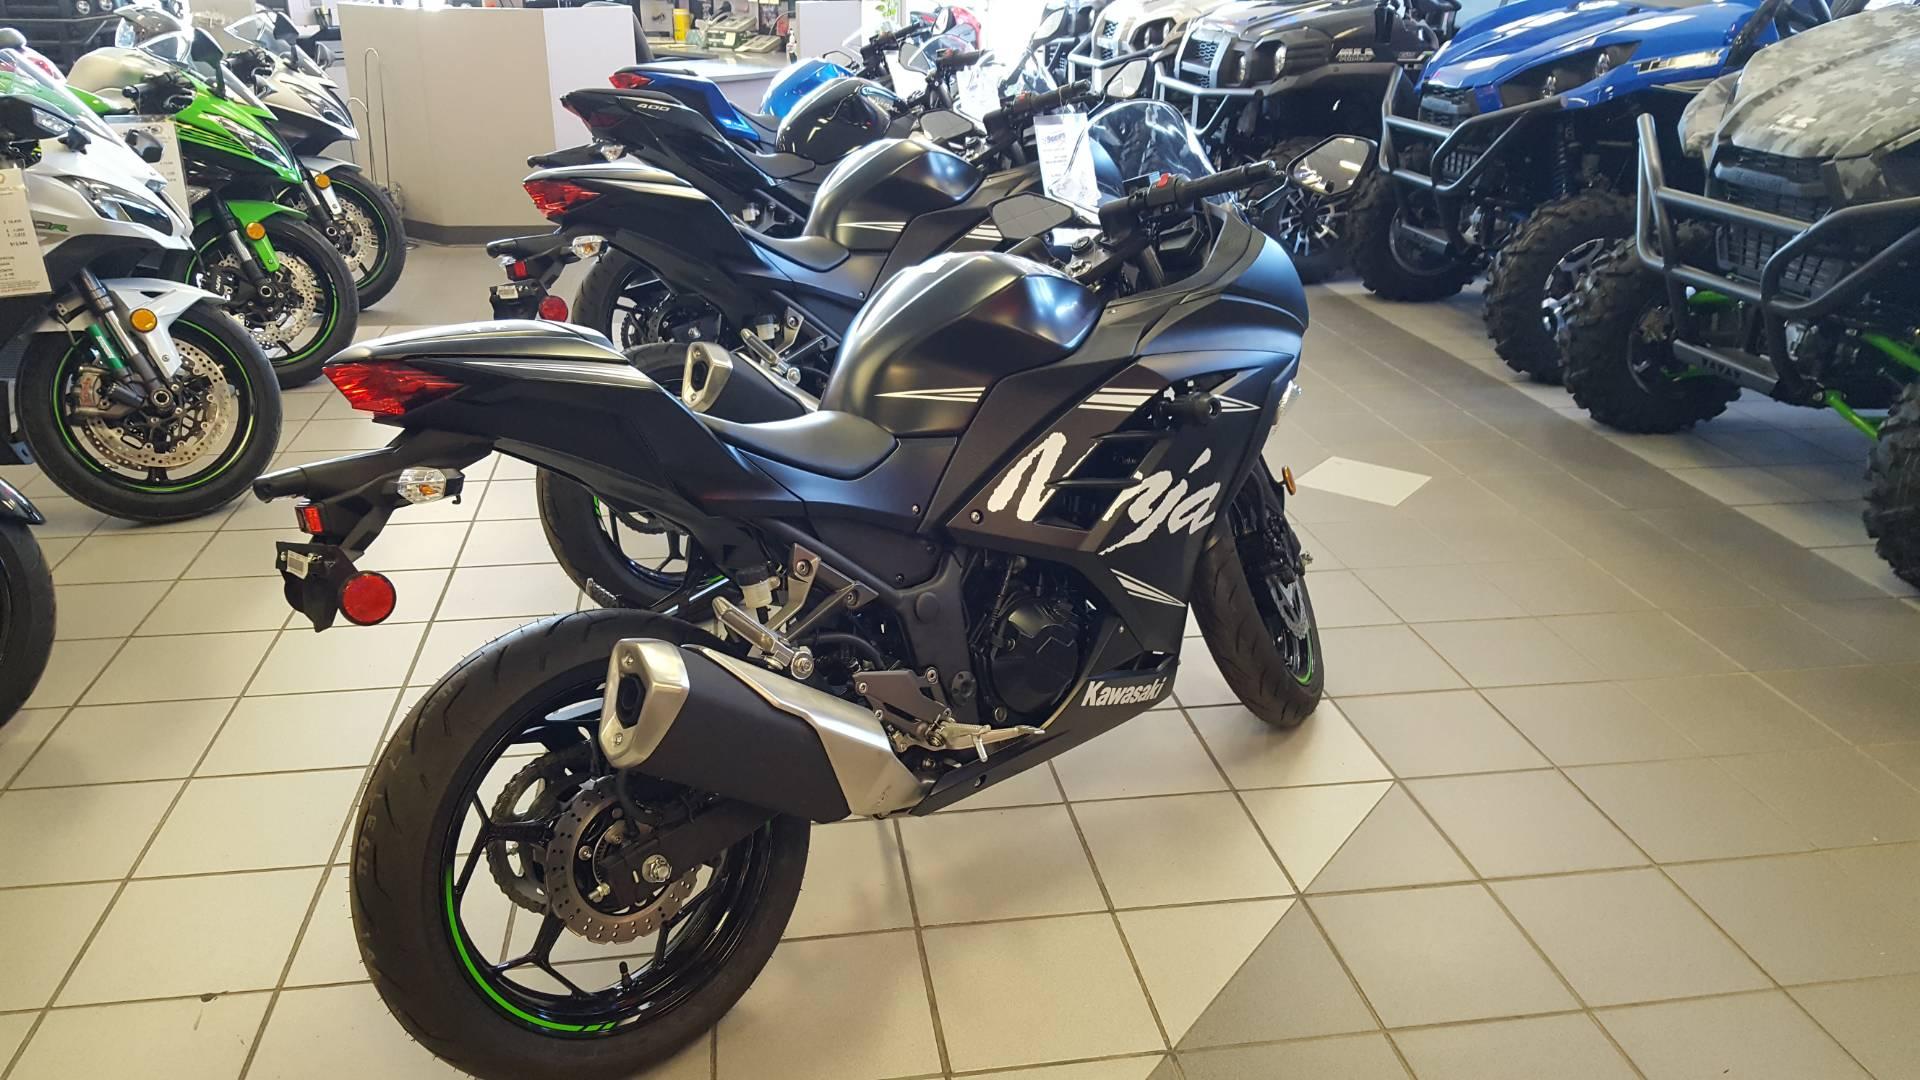 New 2017 Kawasaki Ninja 300 Abs Winter Test Edition Motorcycles In